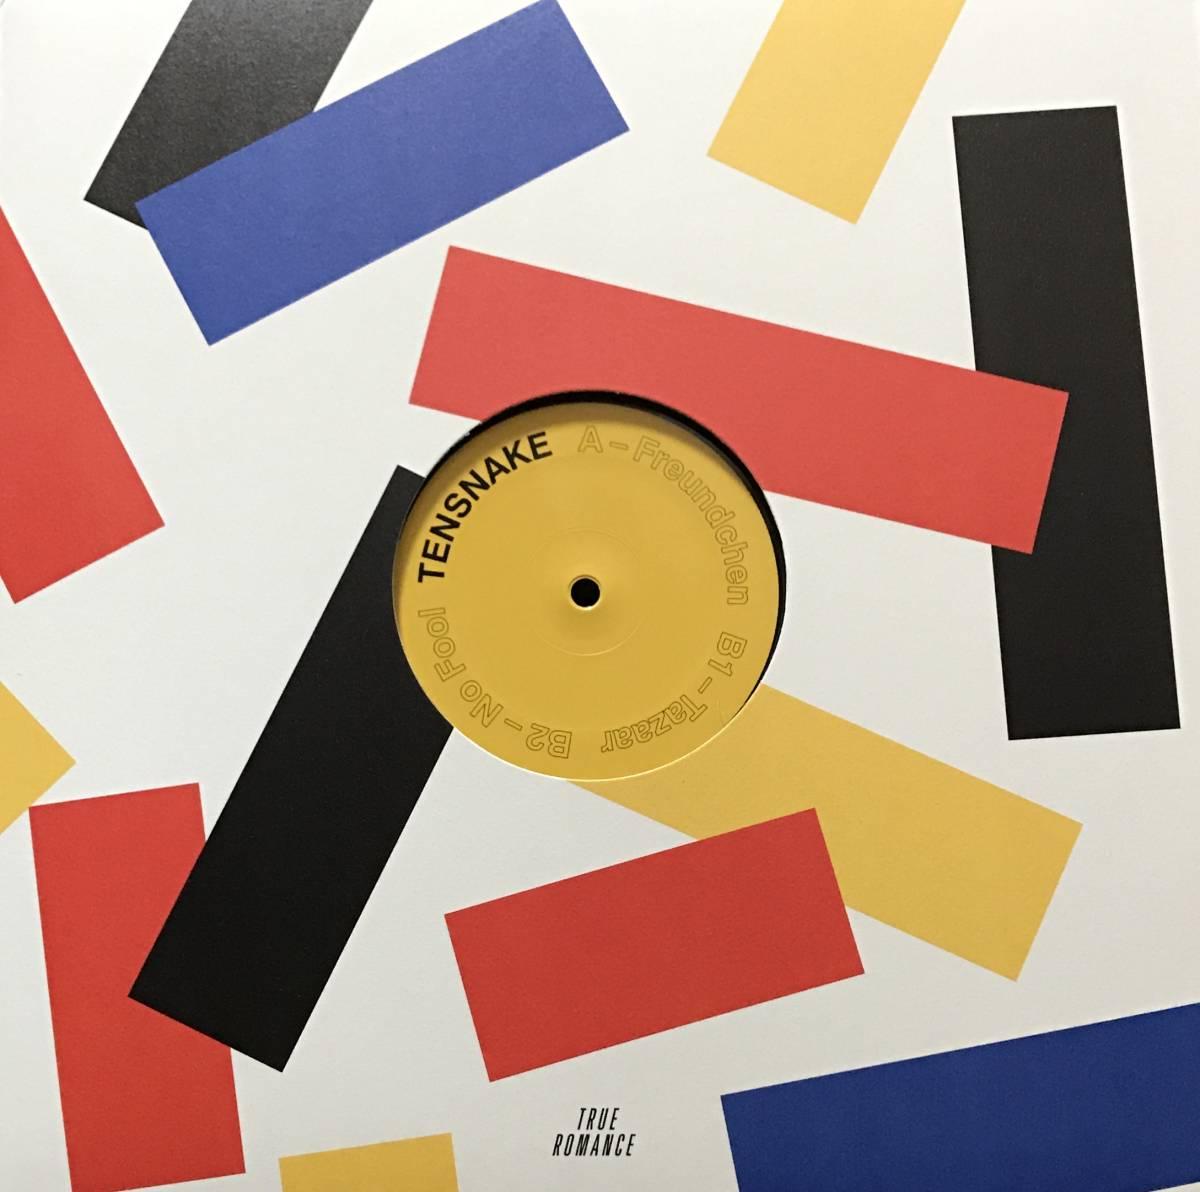 [12] Tensnake - Freundchen (Tech House) ☆True Romance キラー! スペーストリップ! ディスコハウス! レコード Vinyl_画像1